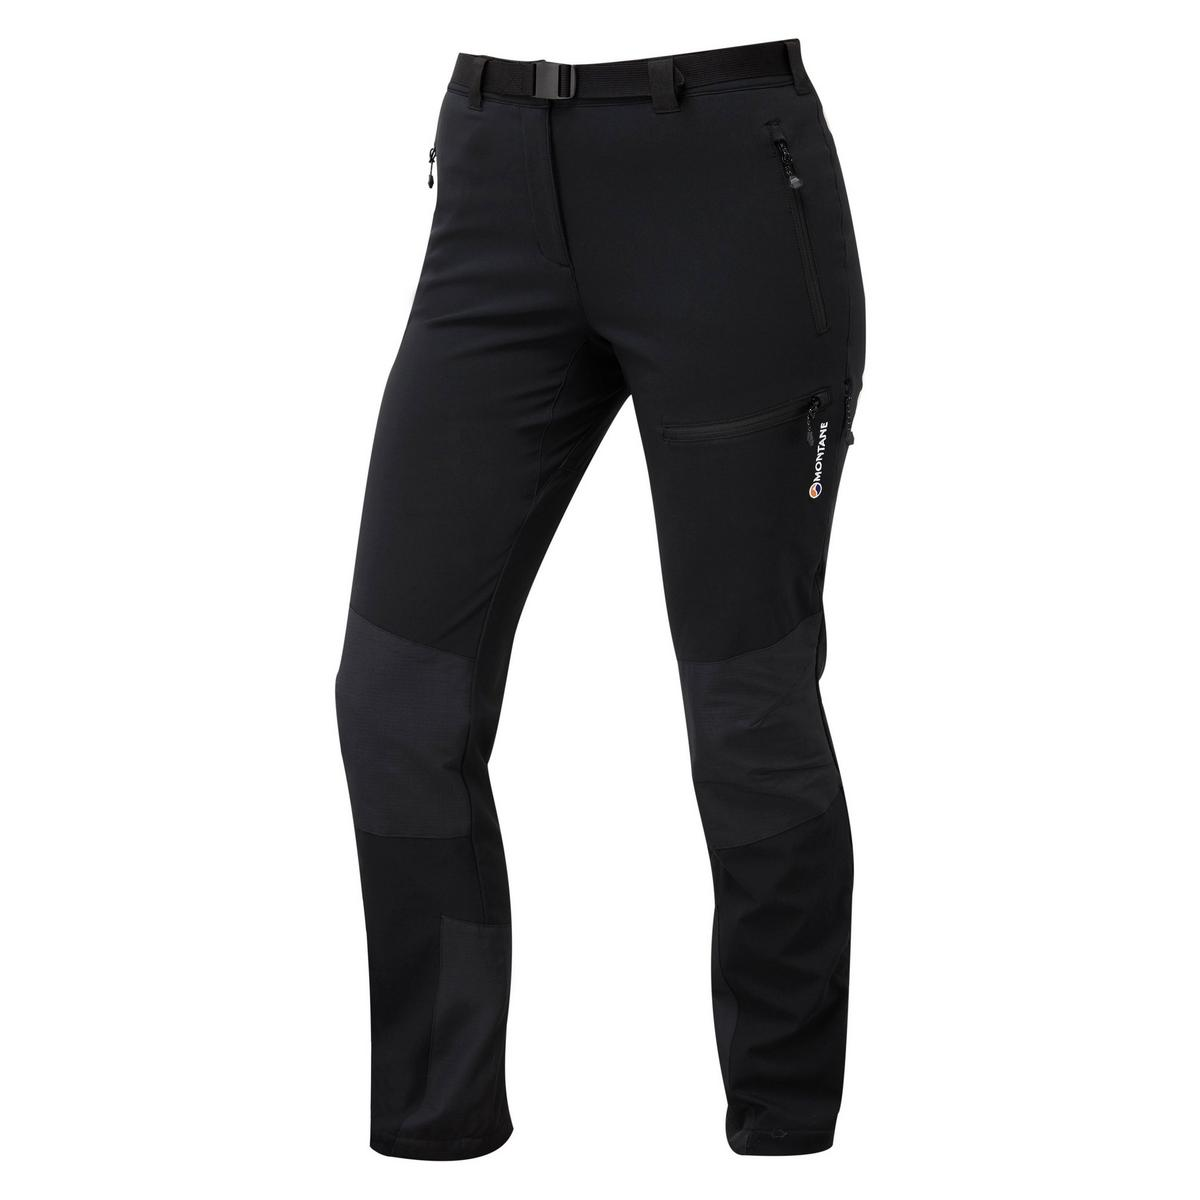 Montane Women's Terra Mission Pants (Short) - Black